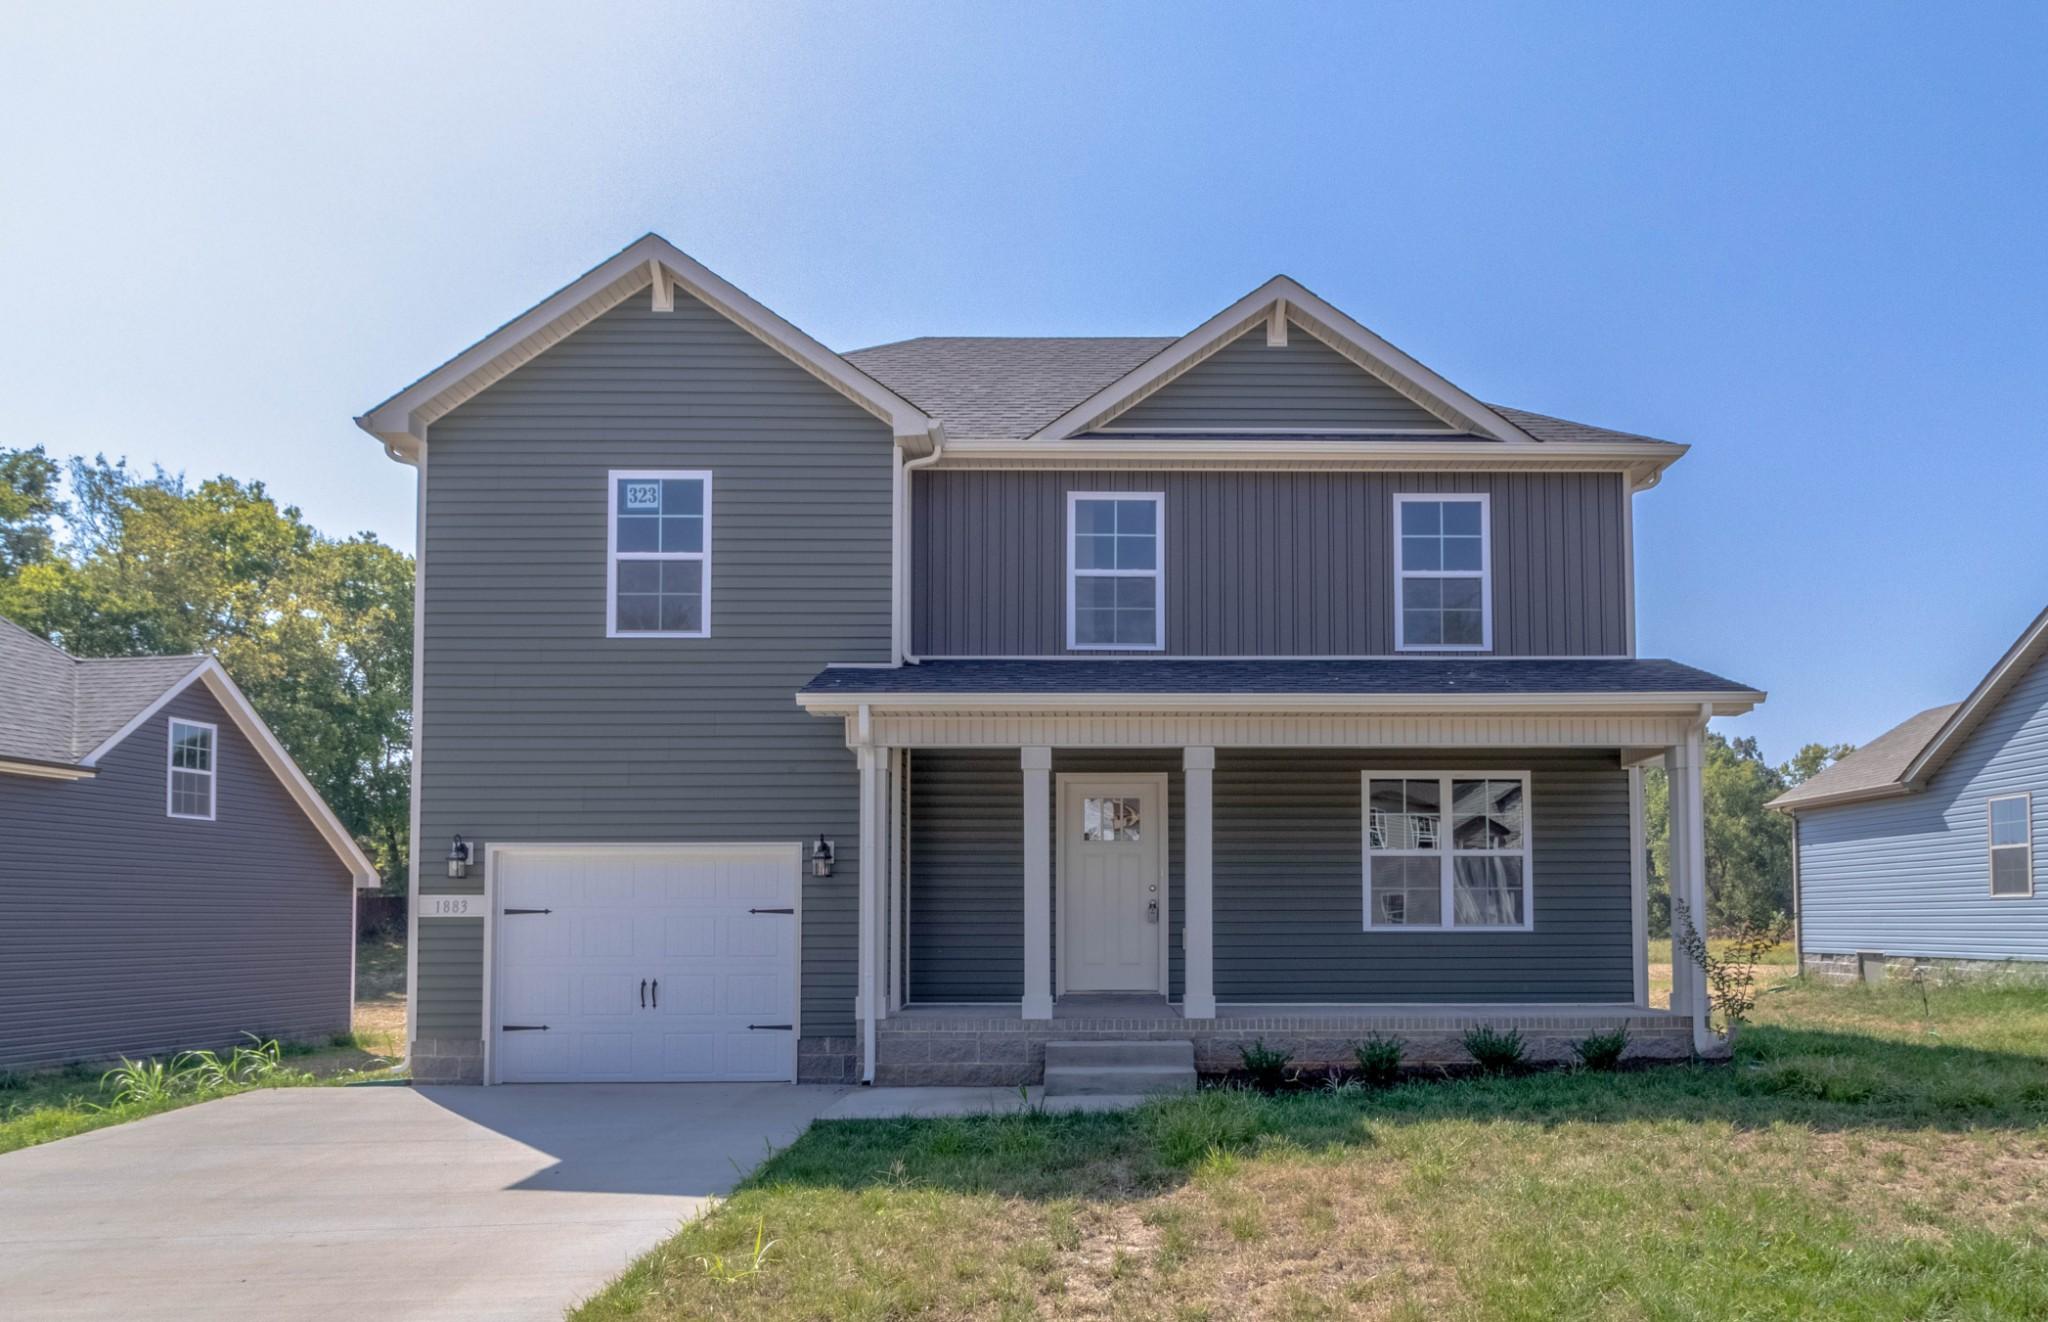 148 Sambar Dr, Clarksville, TN 37040 - Clarksville, TN real estate listing